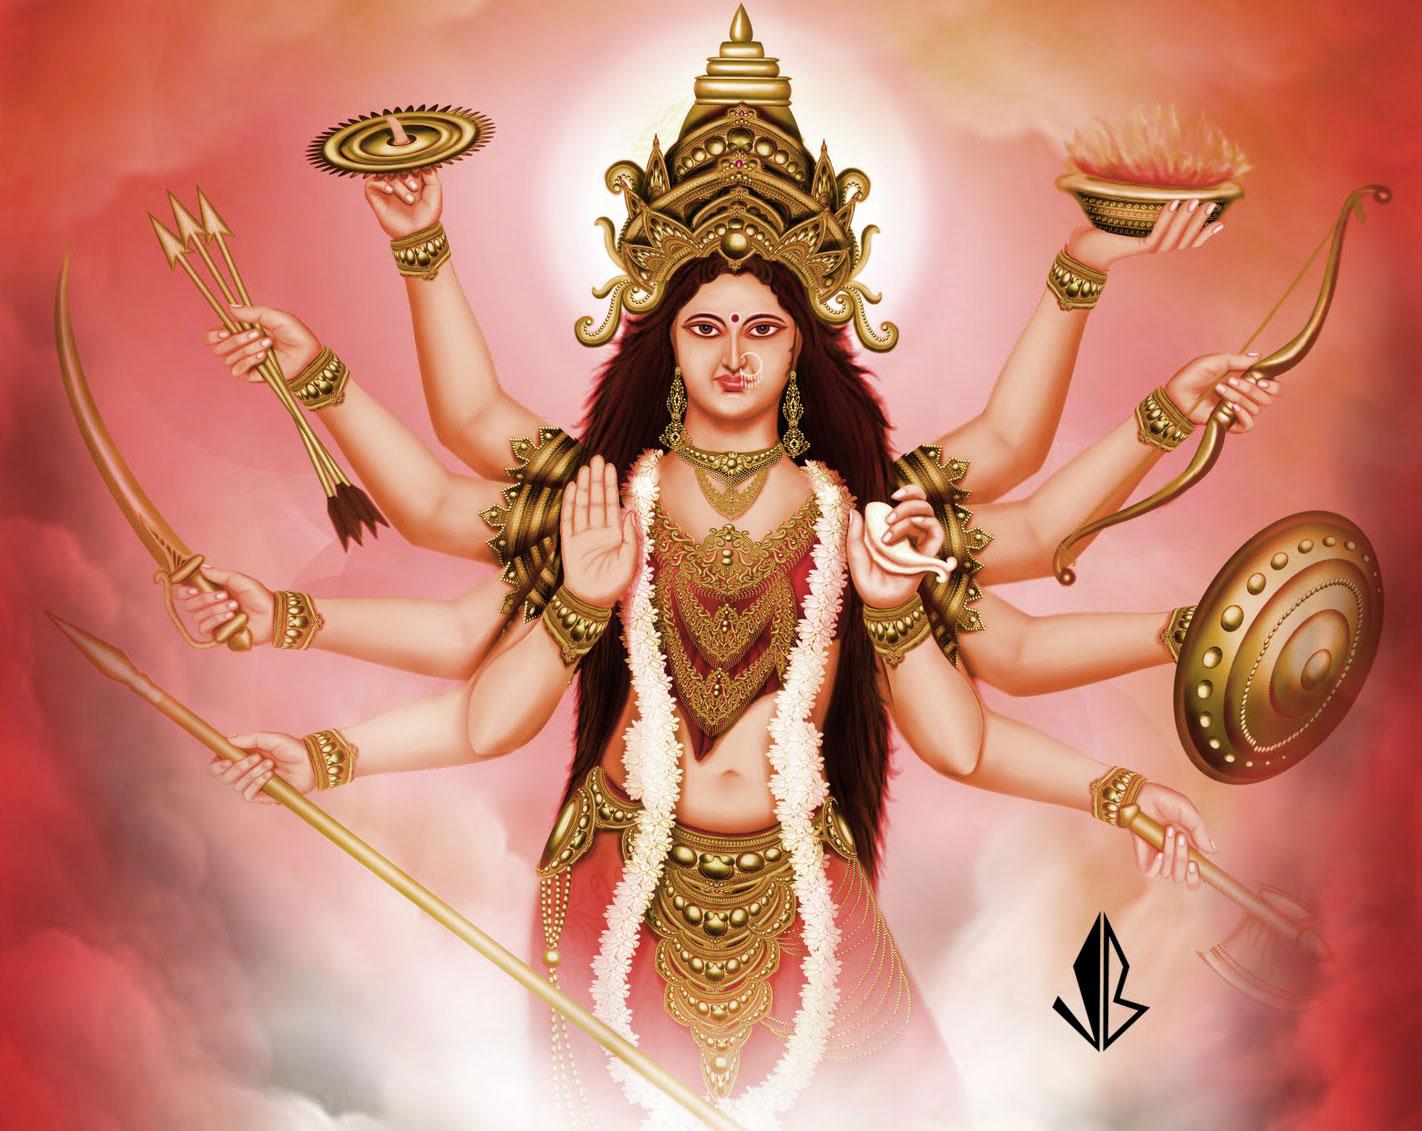 Wallpaper download bhakti - Hd Wallpaper Maa Durga Maa Adi Shakti Durga Beautiful Hd Wallpaper Happy Durga Puja Navratri Download